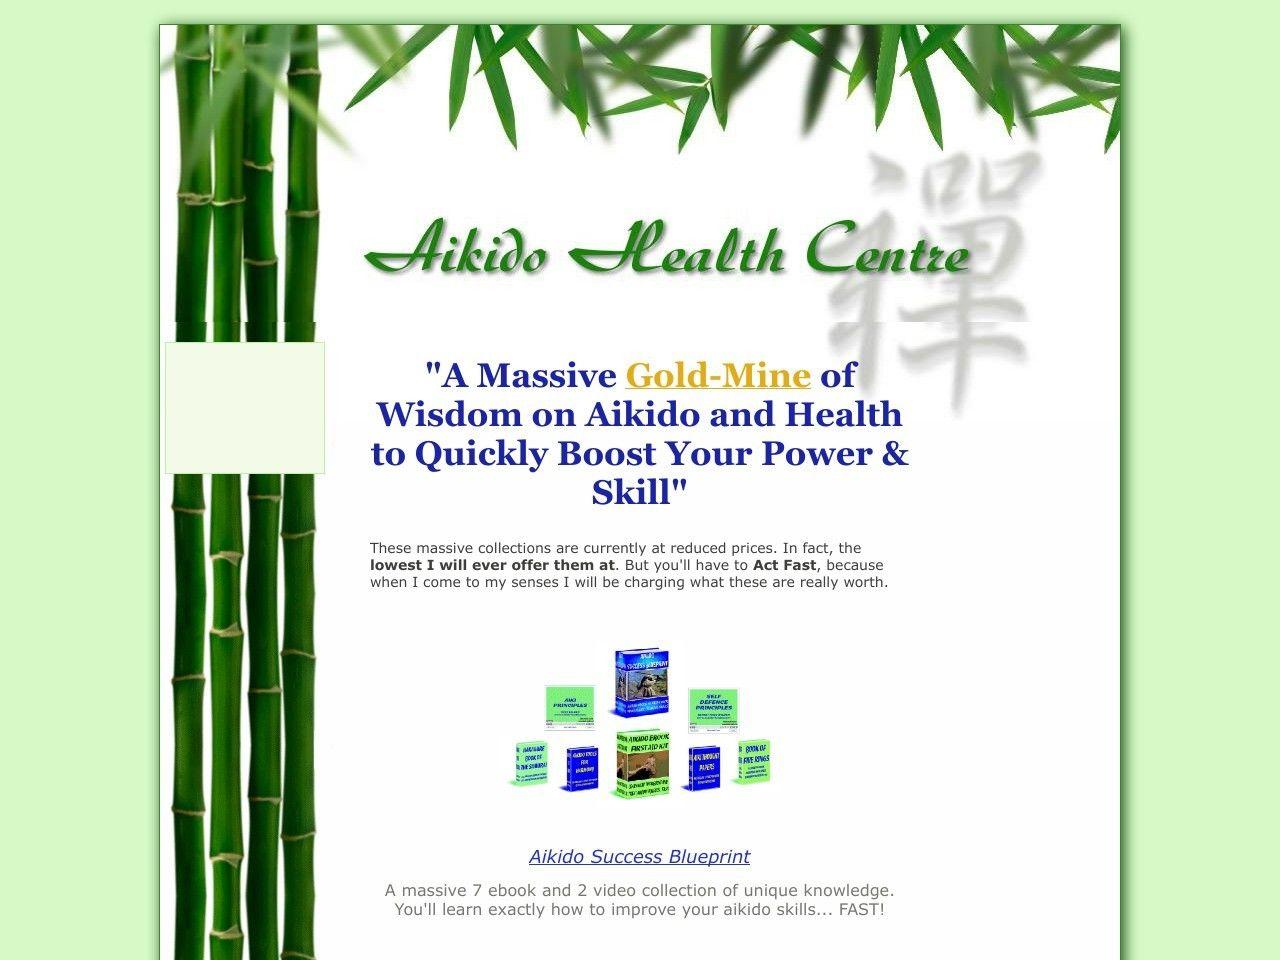 Aikido success blueprint optimum health secrets collections review aikido success blueprint optimum health secrets collections review get full review http malvernweather Gallery